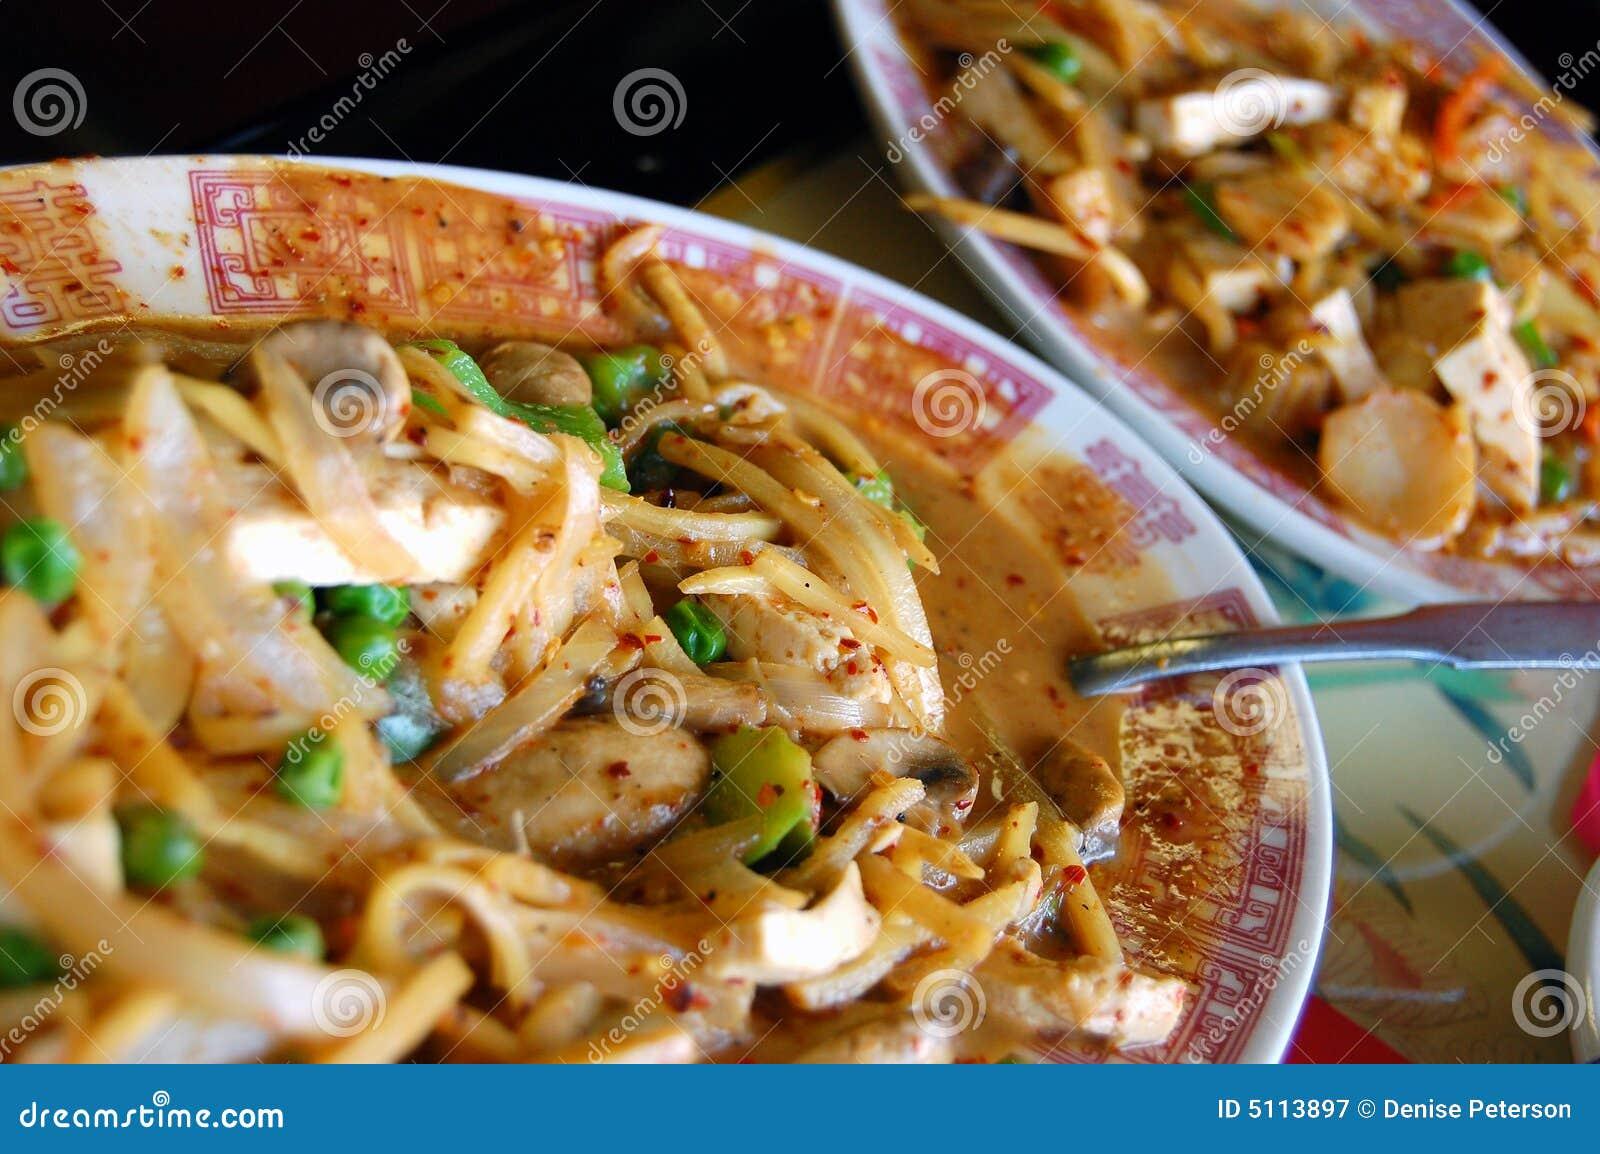 Thai cuisine royalty free stock photography image 5113897 for Cuisine thai